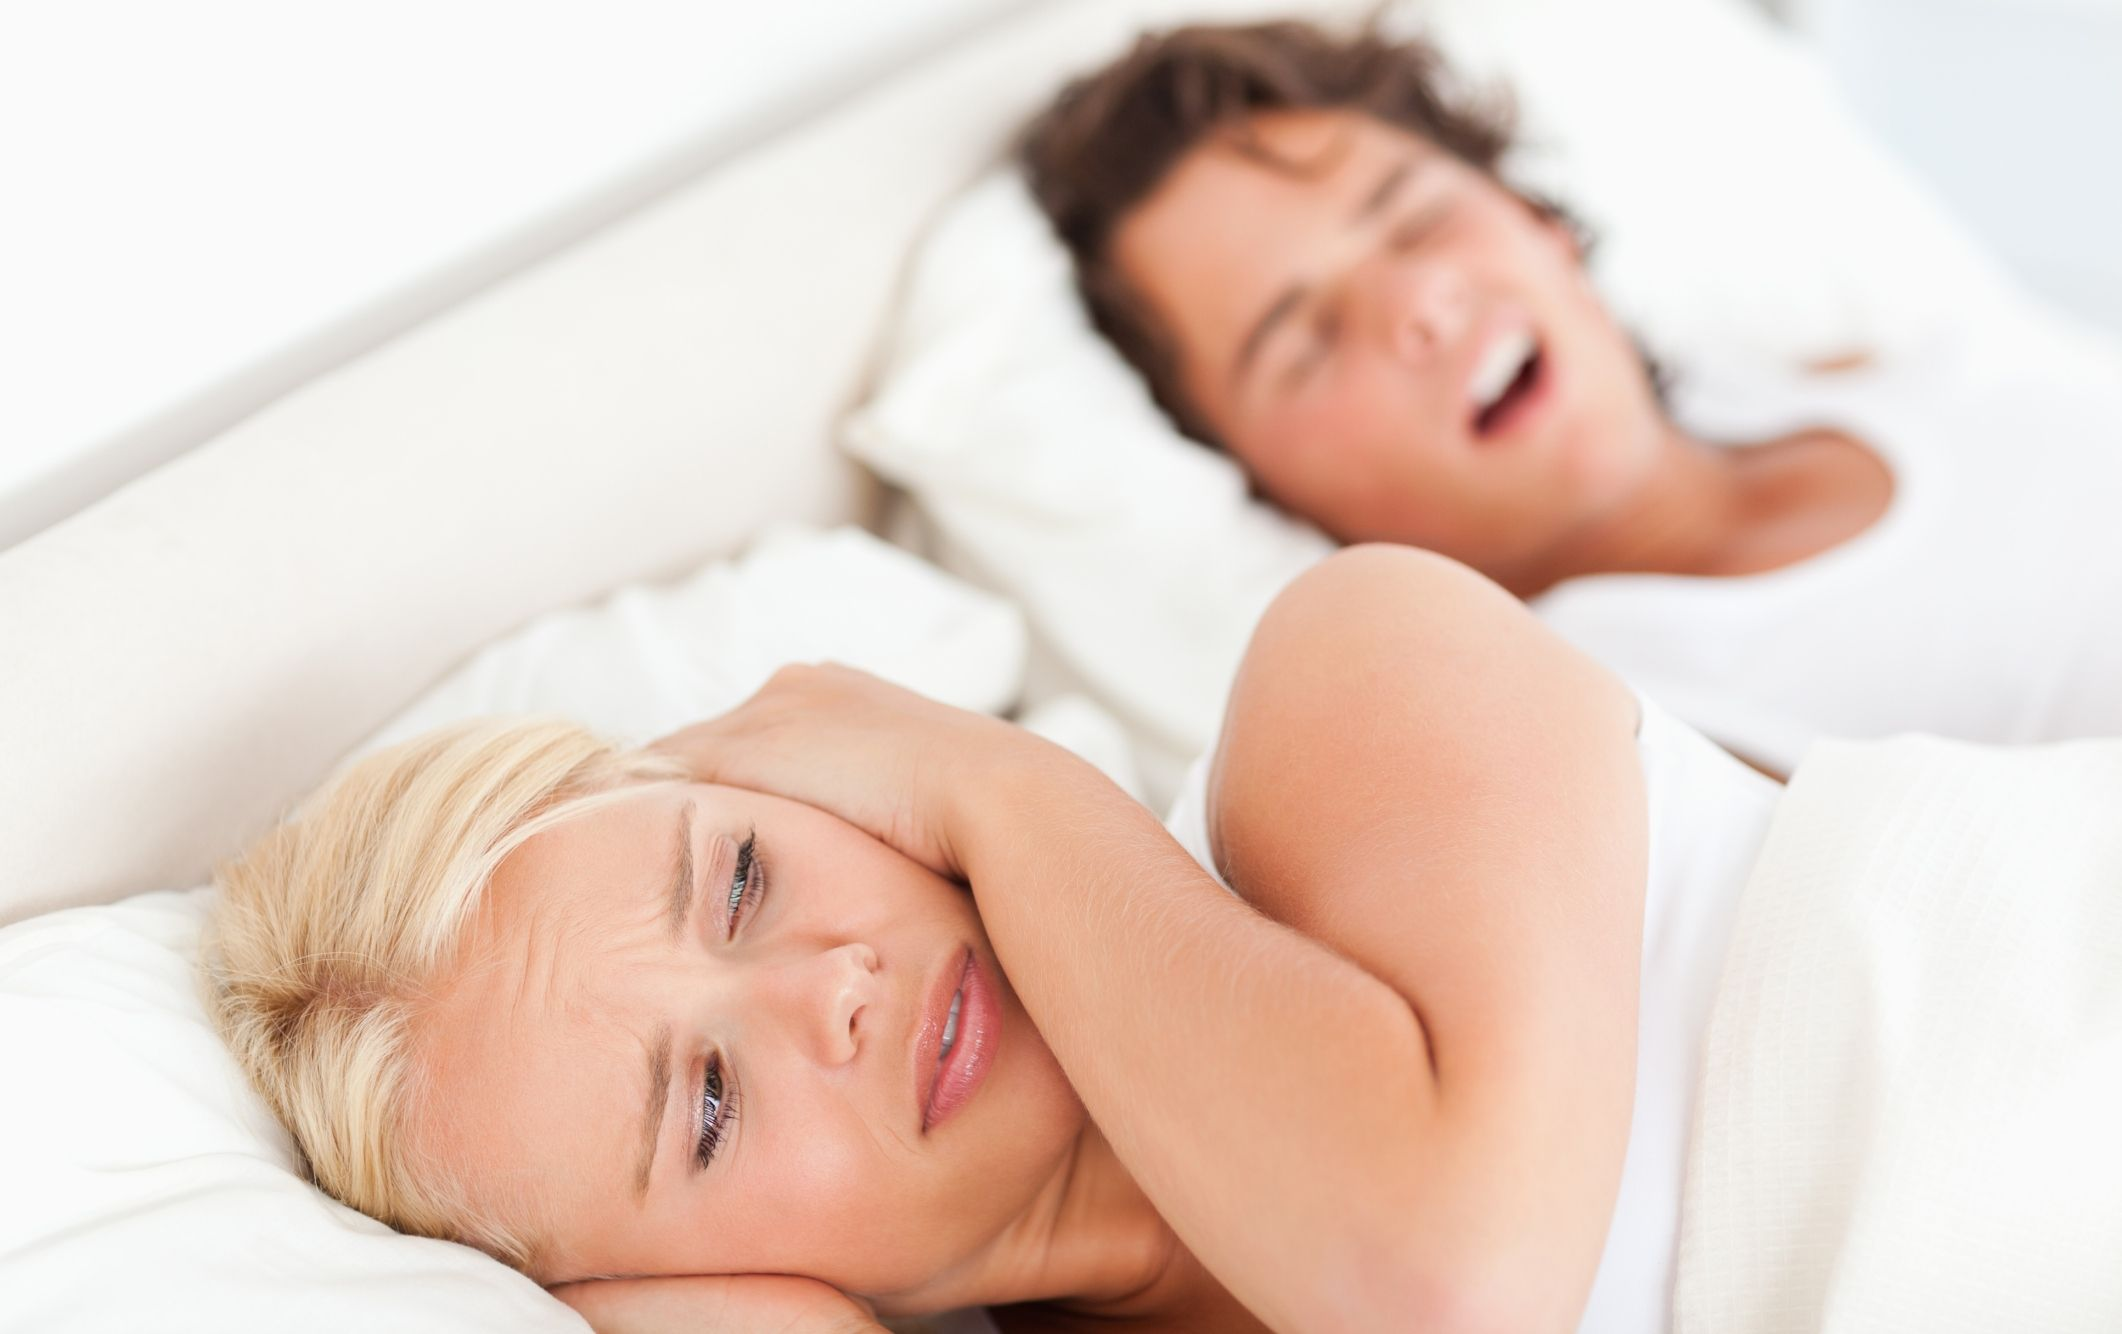 Annoyed woman awaken by her fiance's snoring